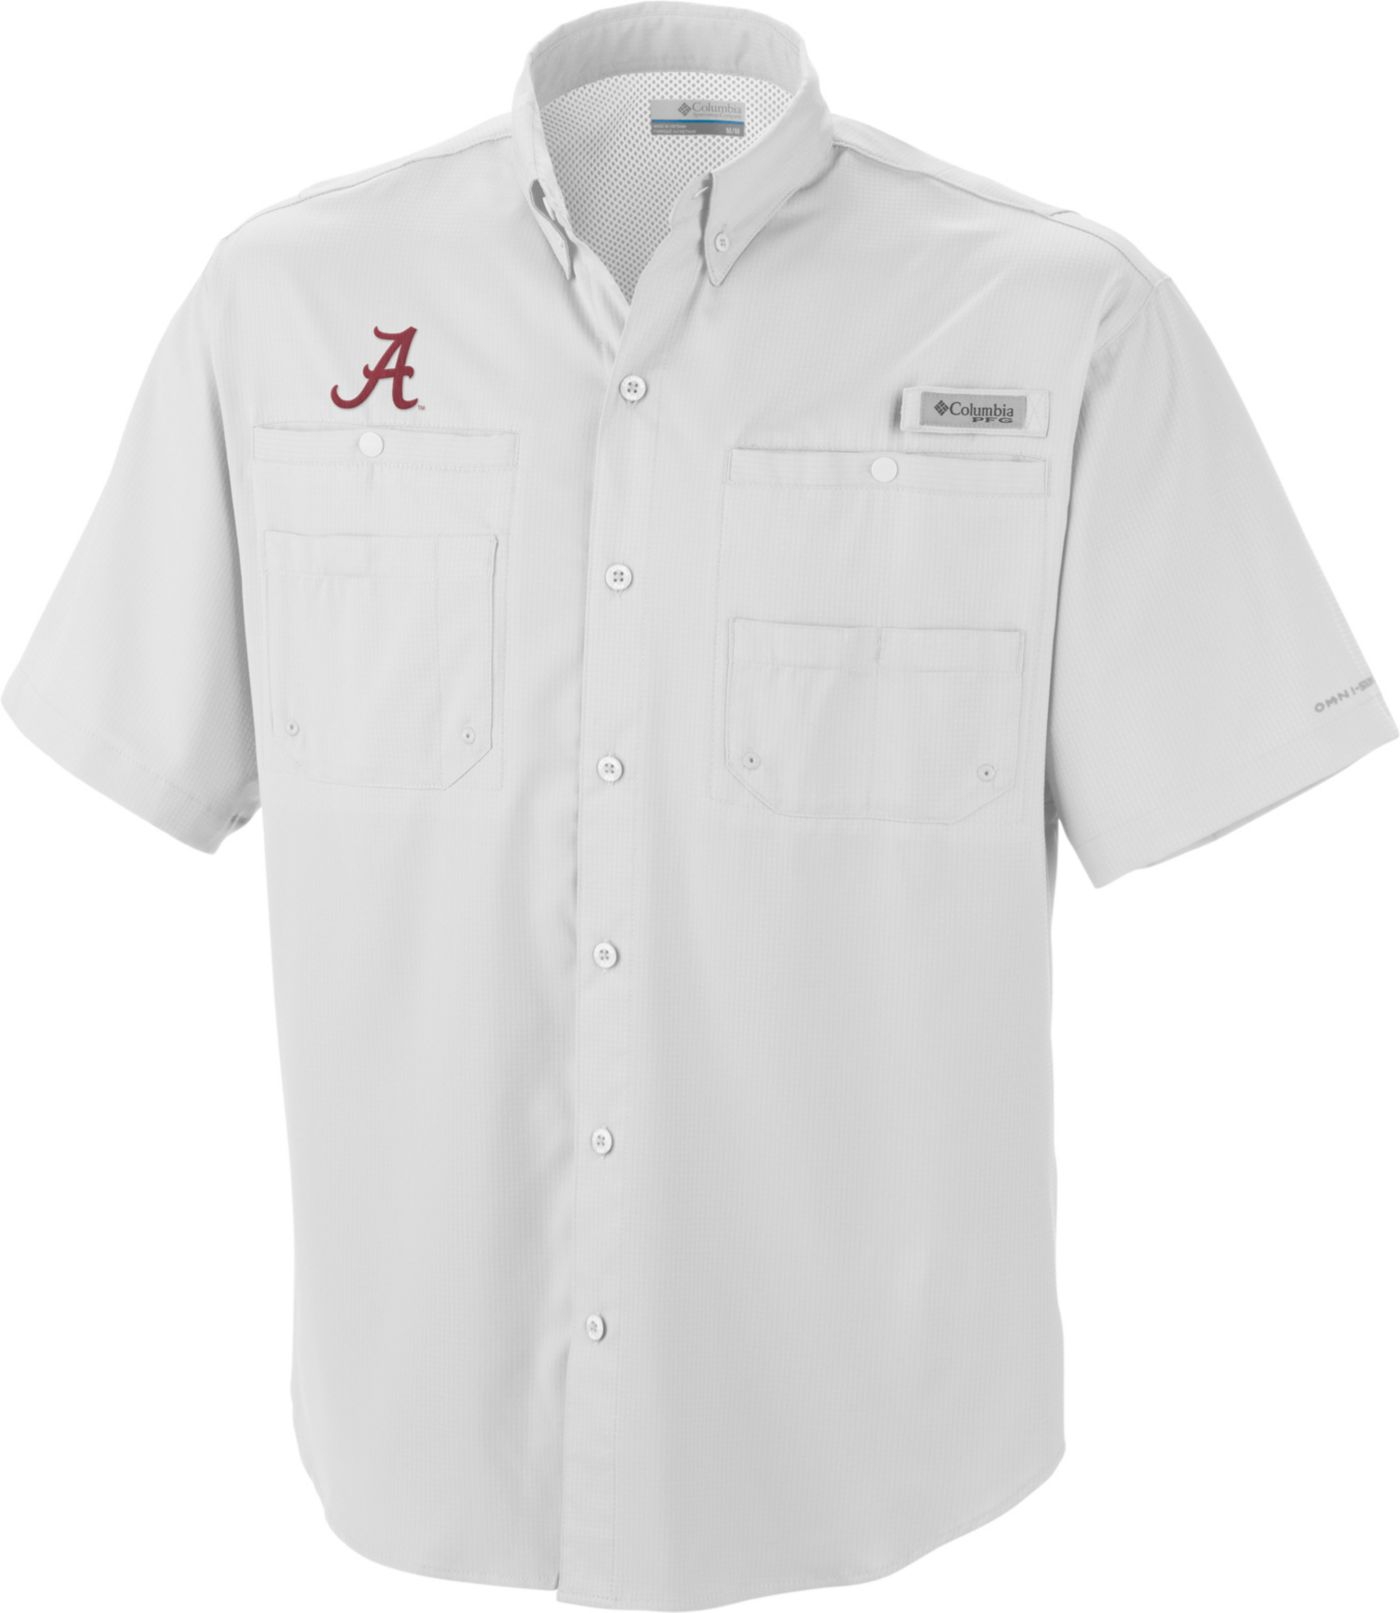 Columbia Men's Alabama Crimson Tide White Tamiami Performance Shirt